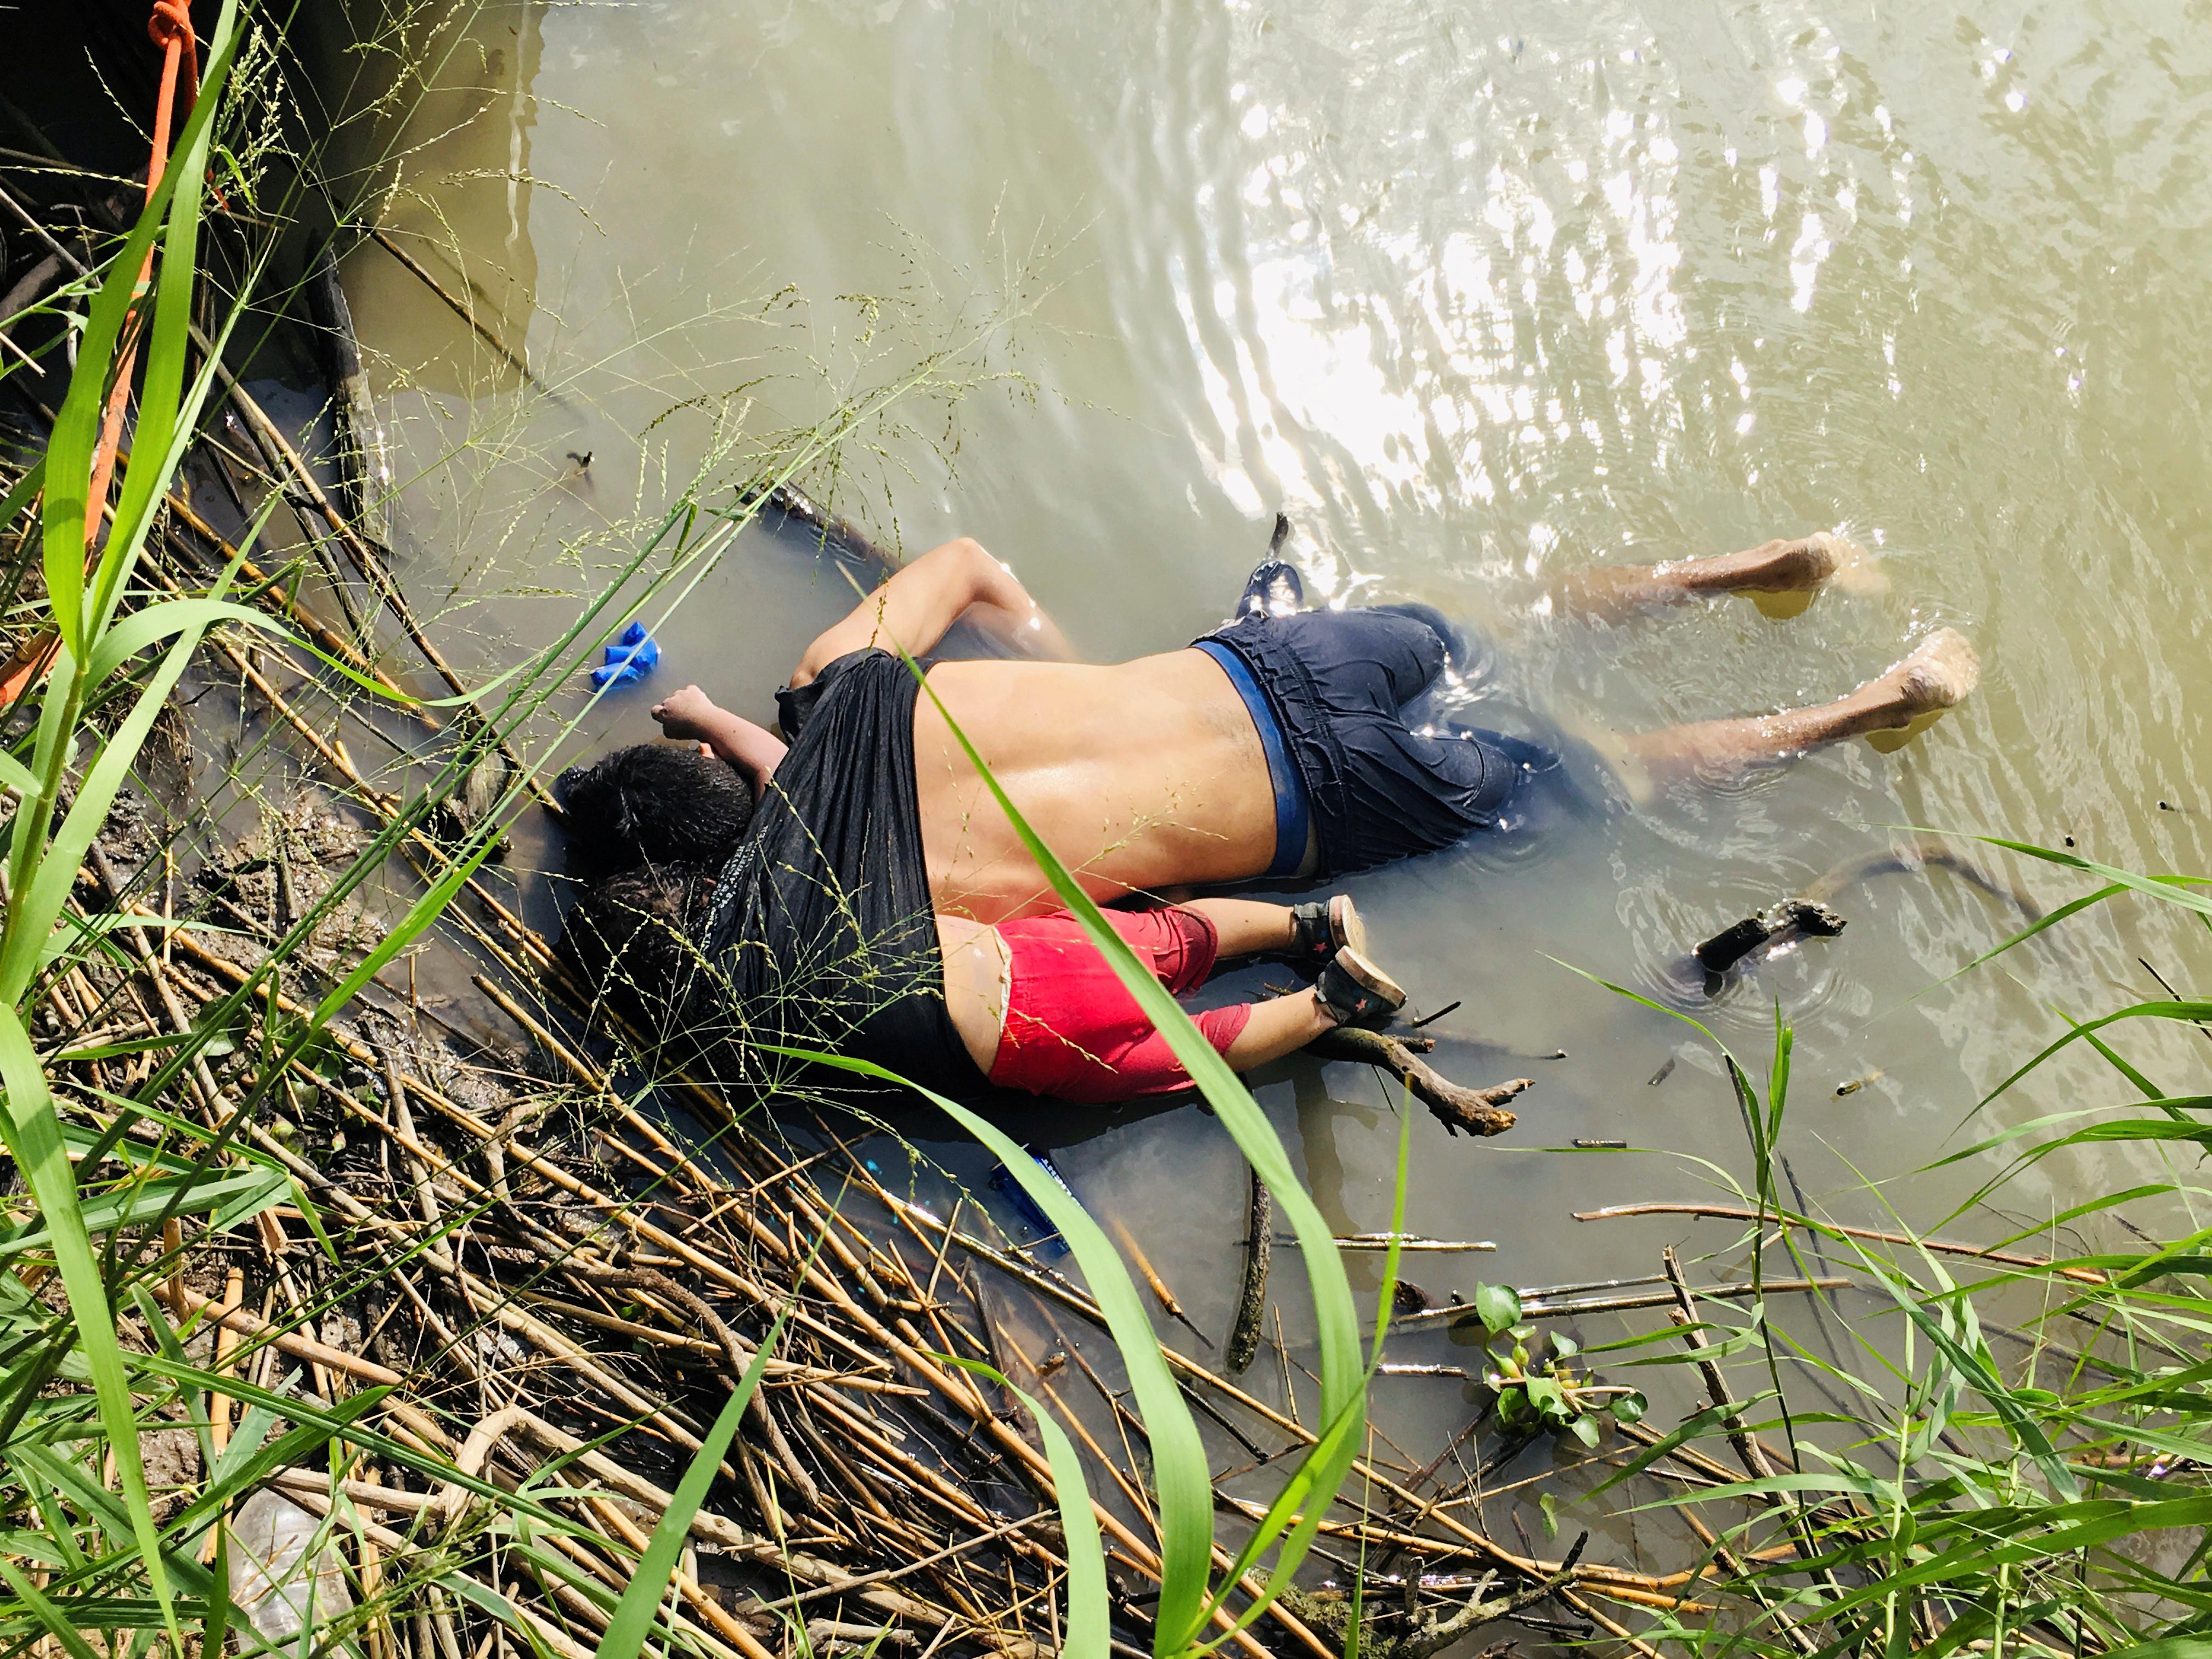 The bodies of Salvadoran migrant Oscar Alberto Martinez Ramirez and his daughter Valeria lie in the Rio Bravo river in Matamoros, in Tamaulipas state, Mexico June 24, 2019. REUTERS/Stringer